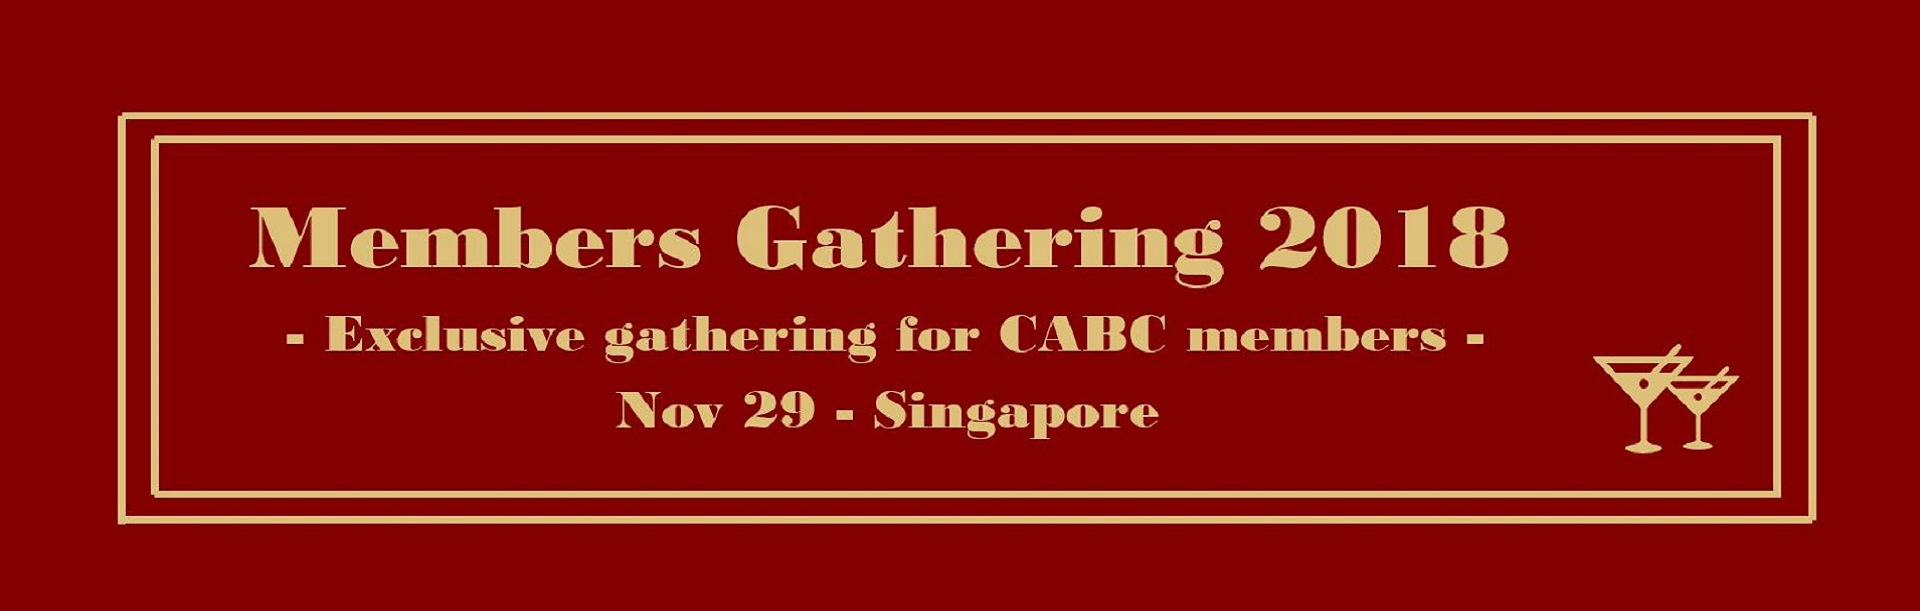 CABC Members Gathering 2018 Banner Image